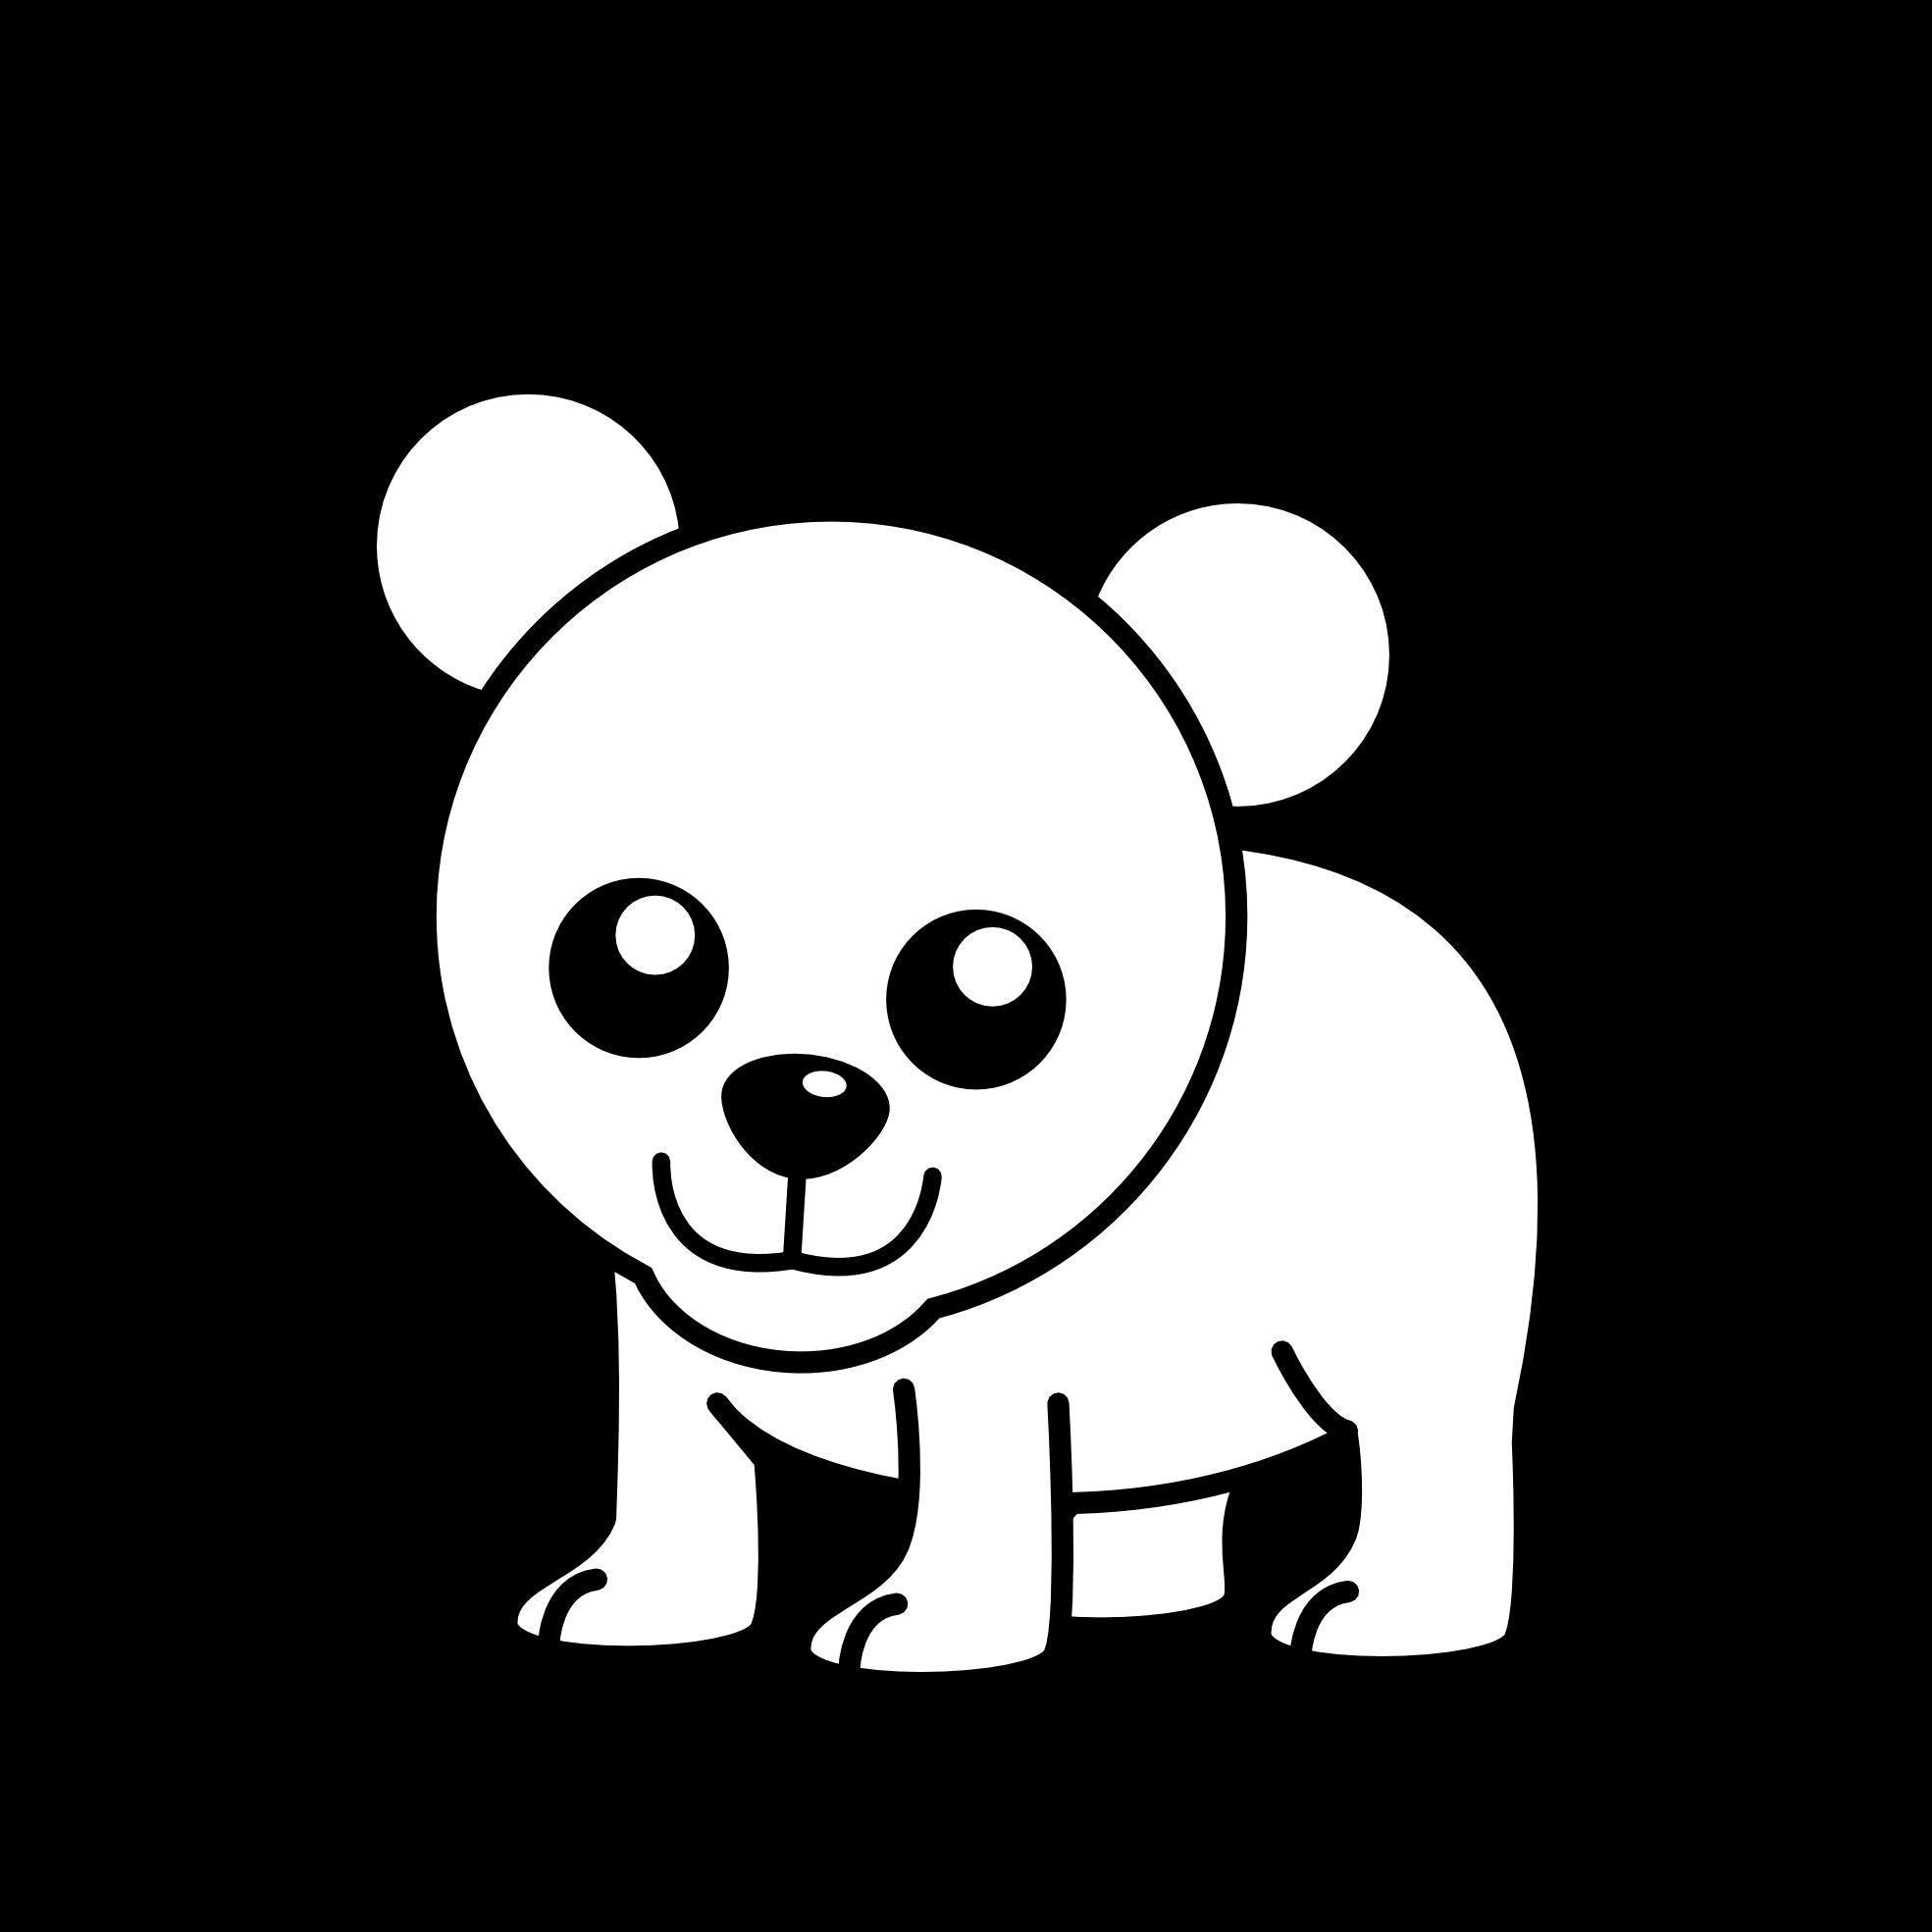 Christmas polar bear clipart banner free download Polar Bear Cartoon Drawing at GetDrawings.com | Free for personal ... banner free download